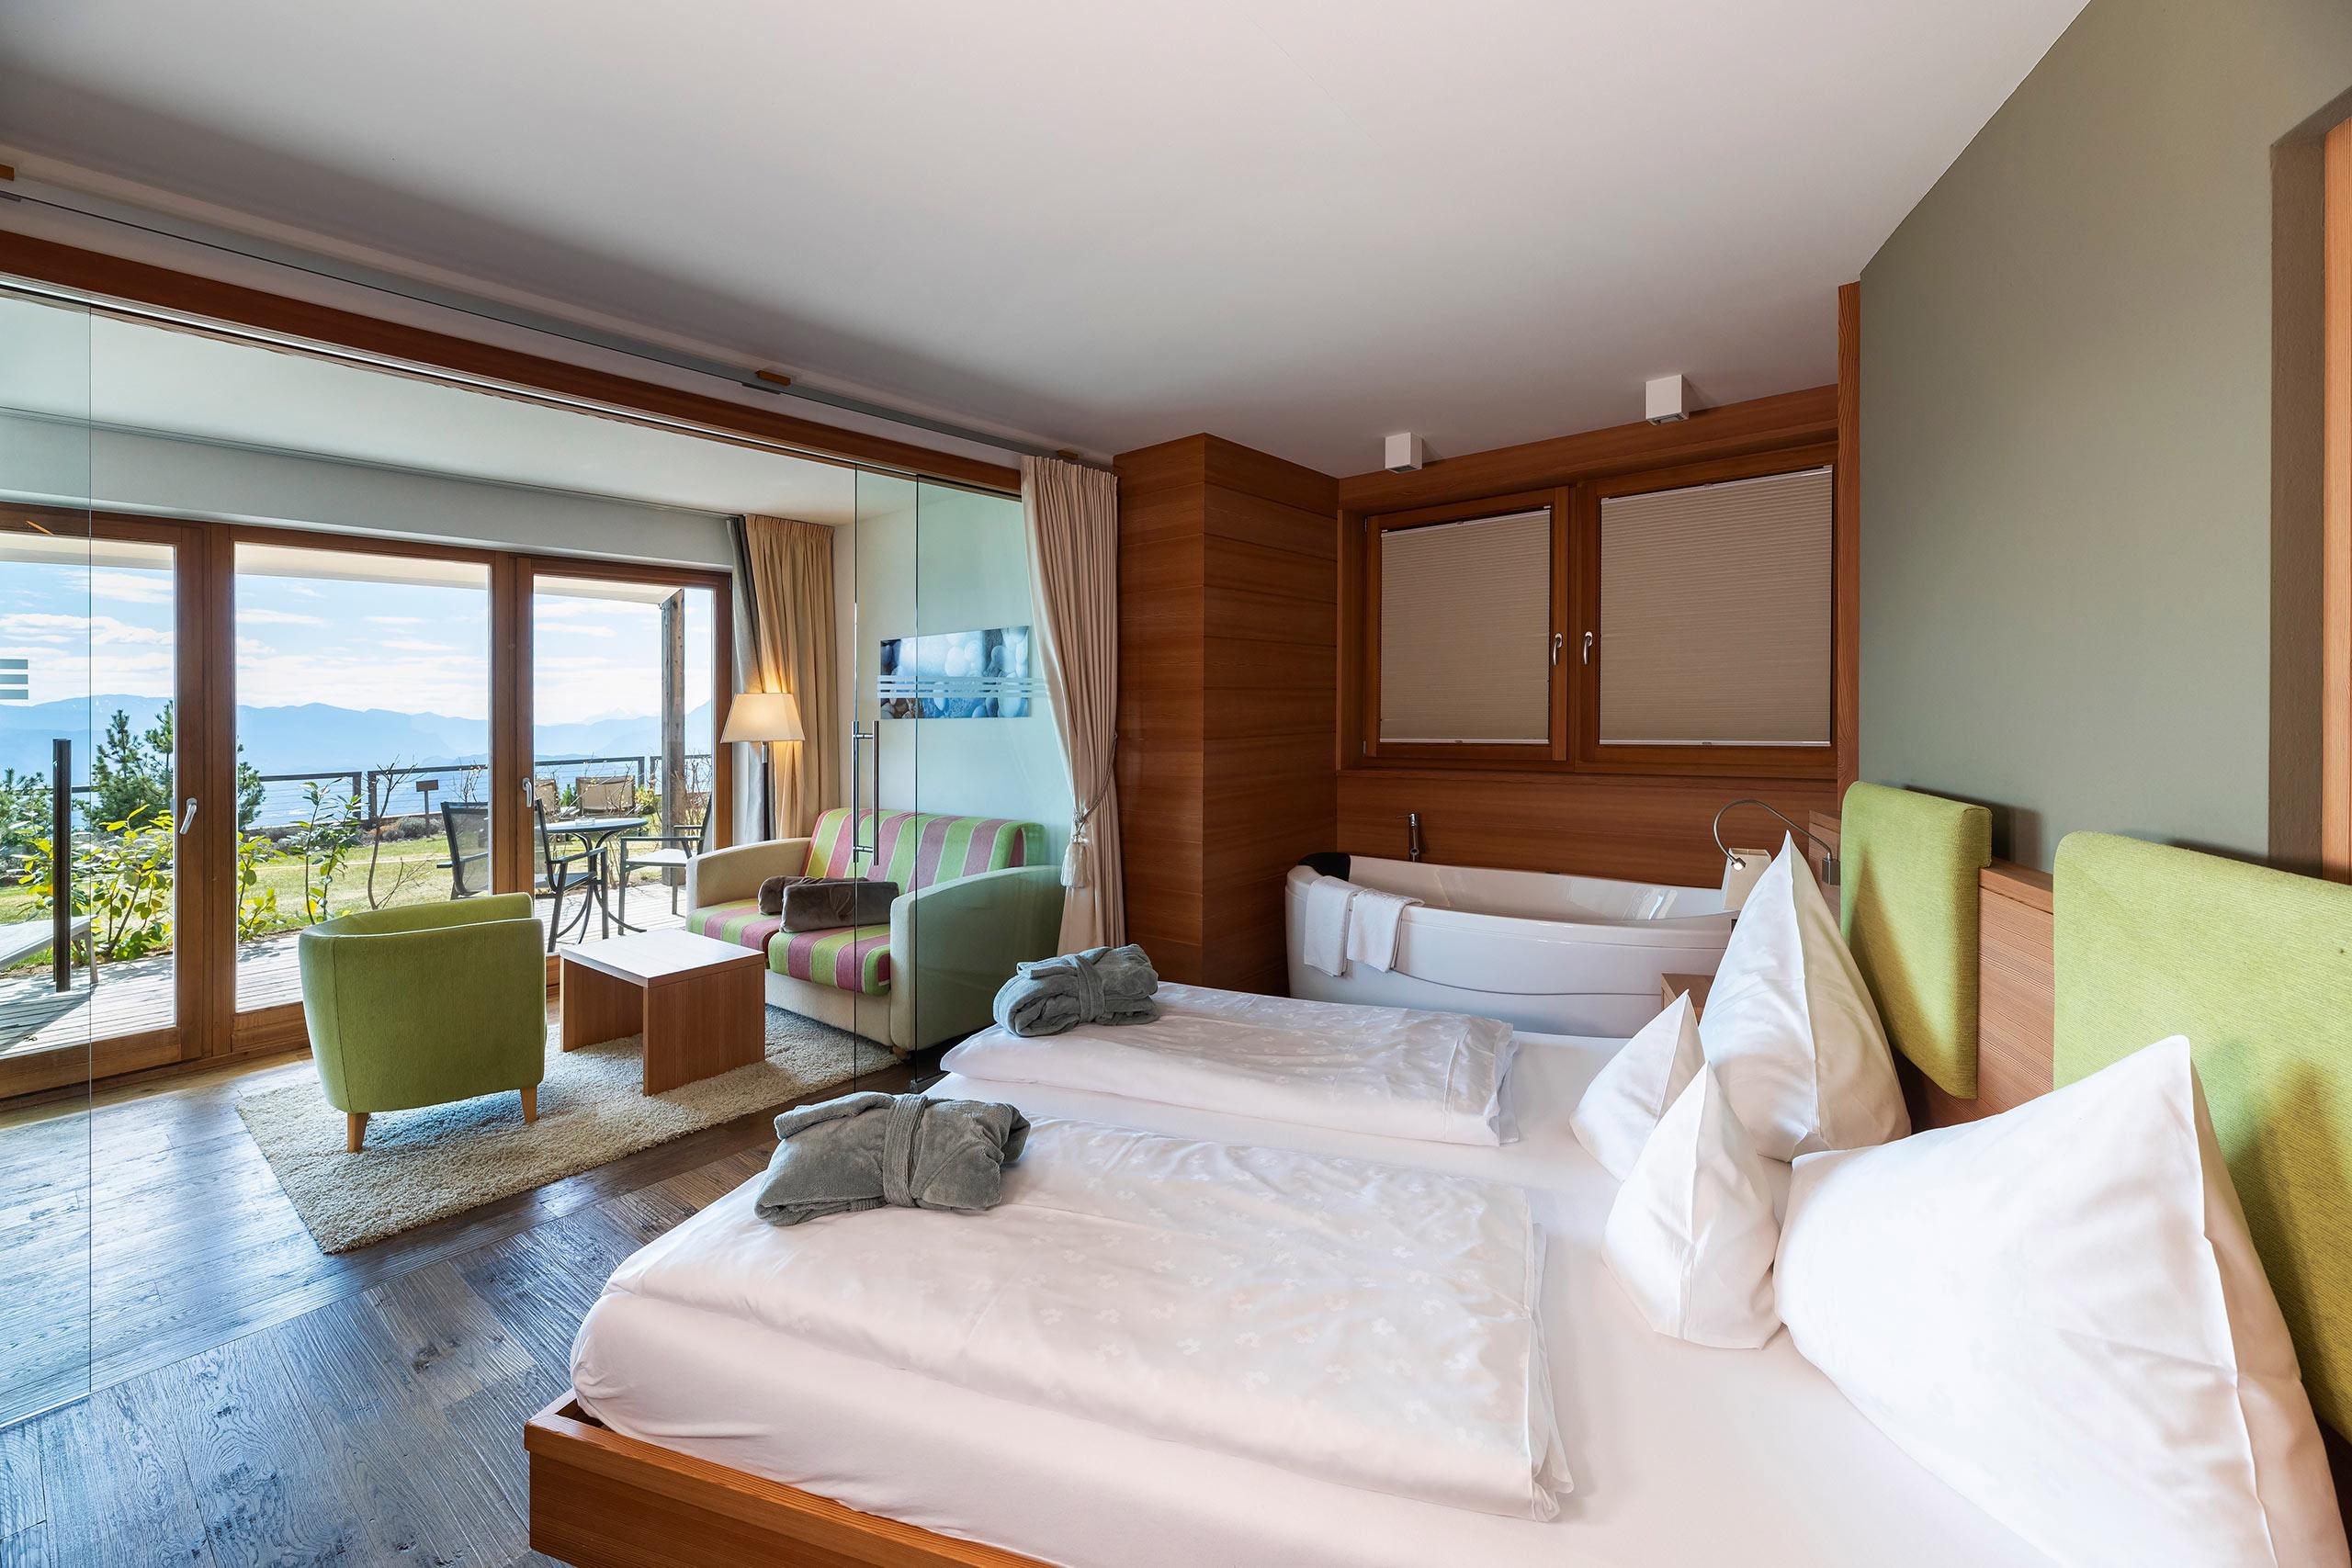 hotel_belvedere_jenesien_referenz_03